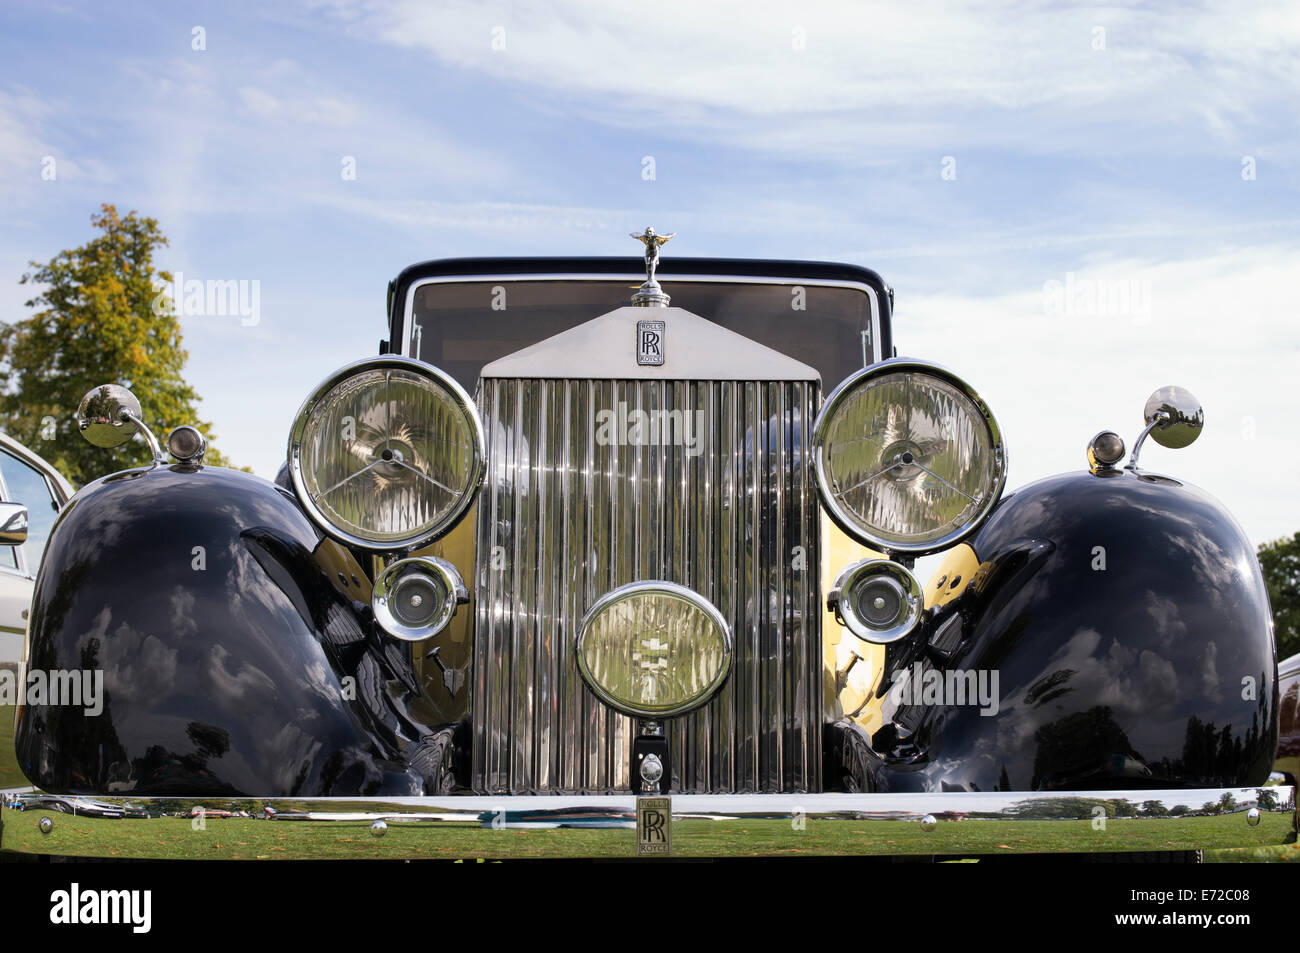 Vintage Rolls Royce car at Blenheim Palace Car show. Oxfordshire, England - Stock Image